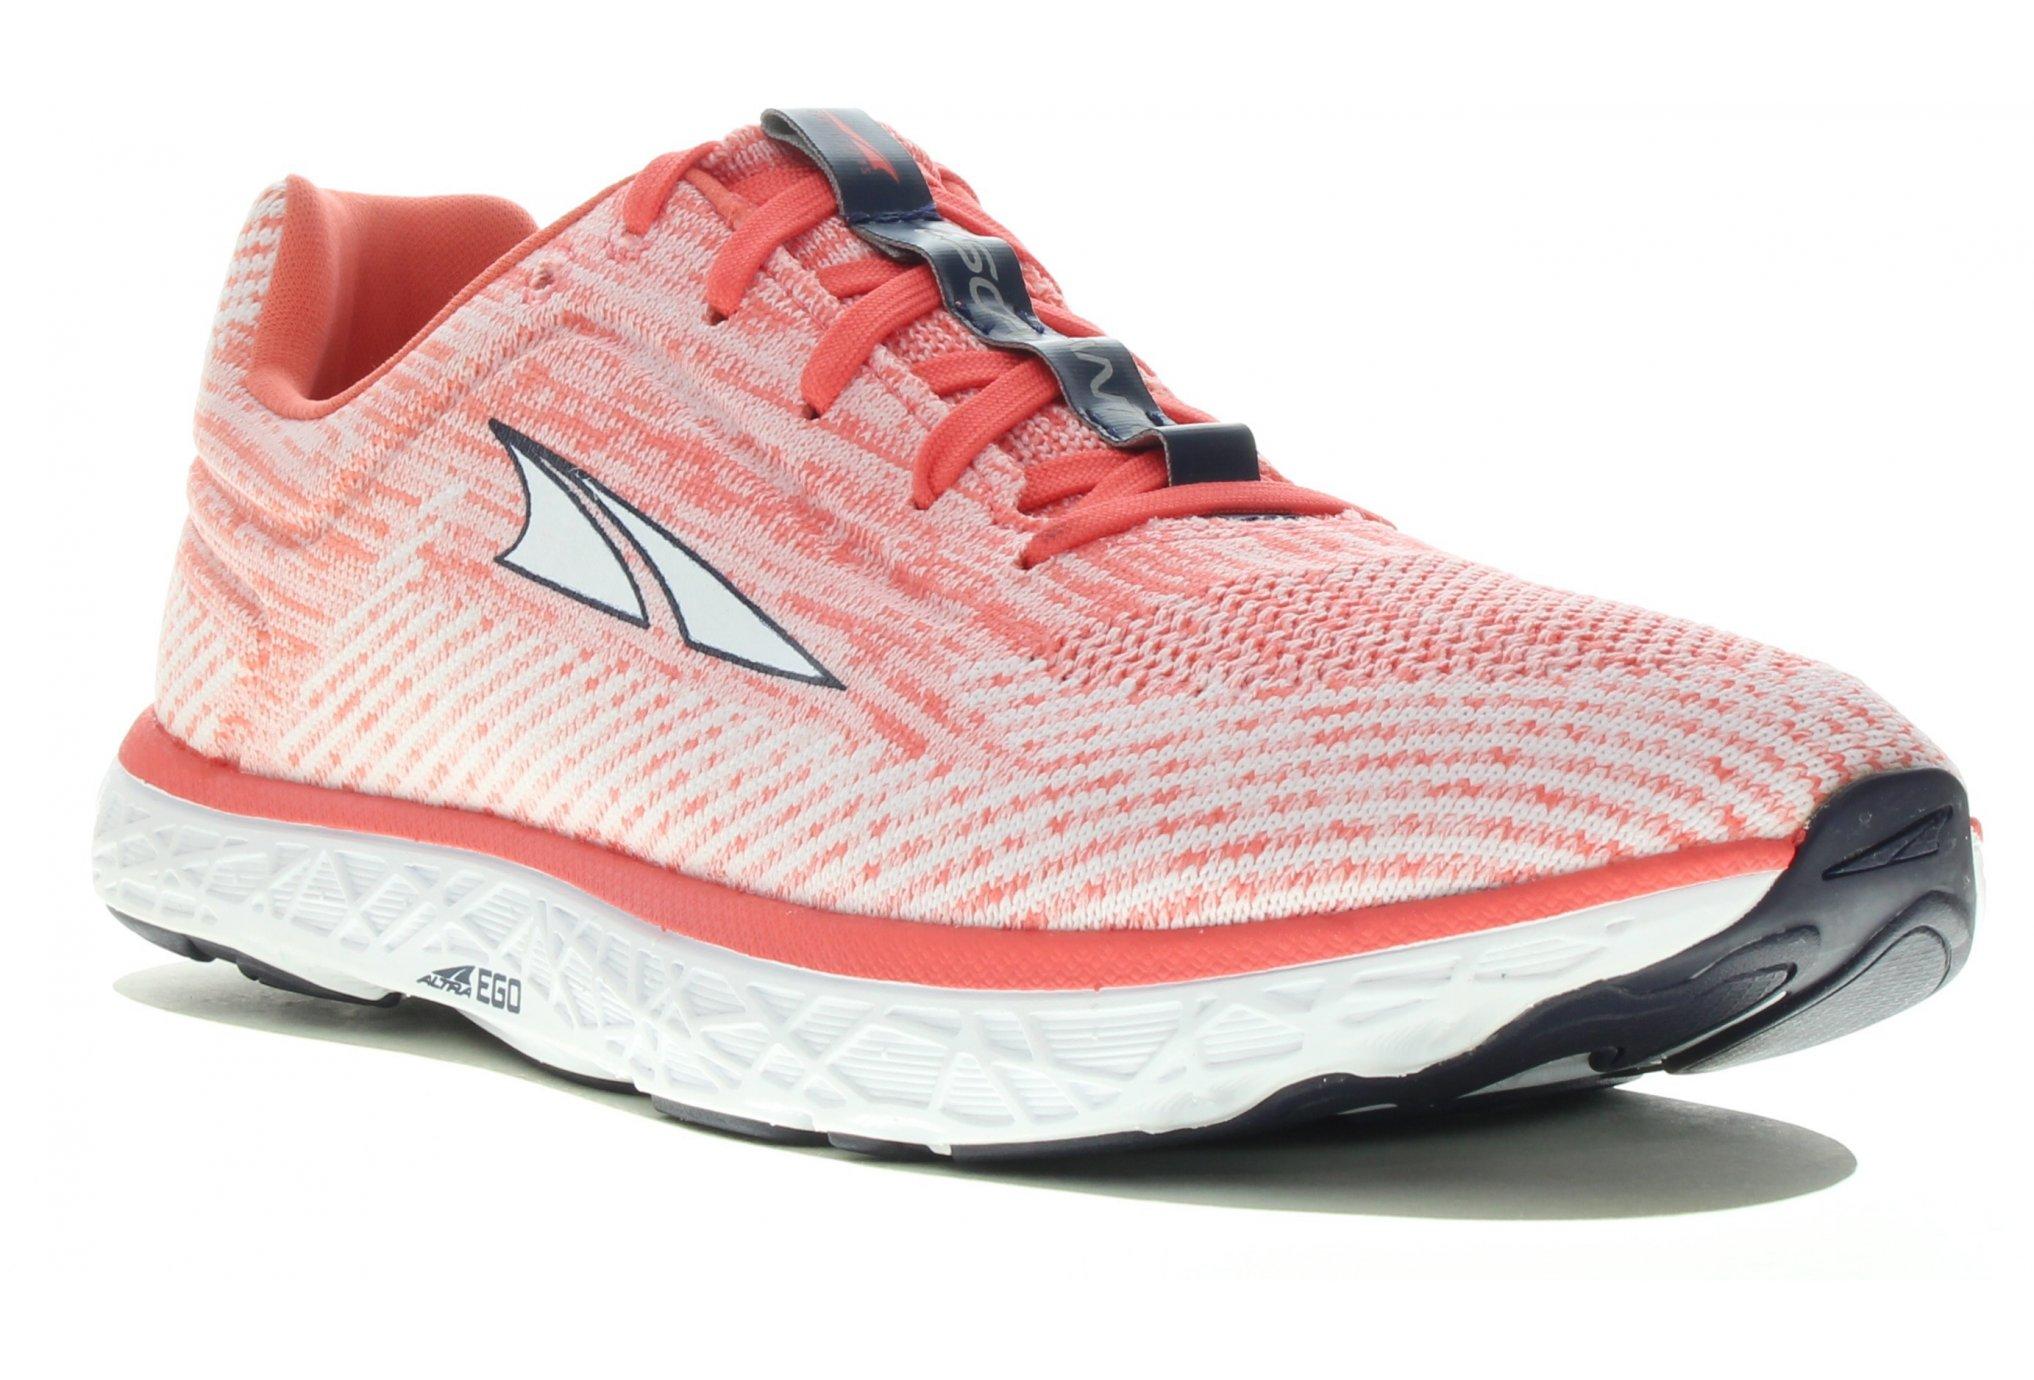 Altra Escalante 2 Chaussures running femme